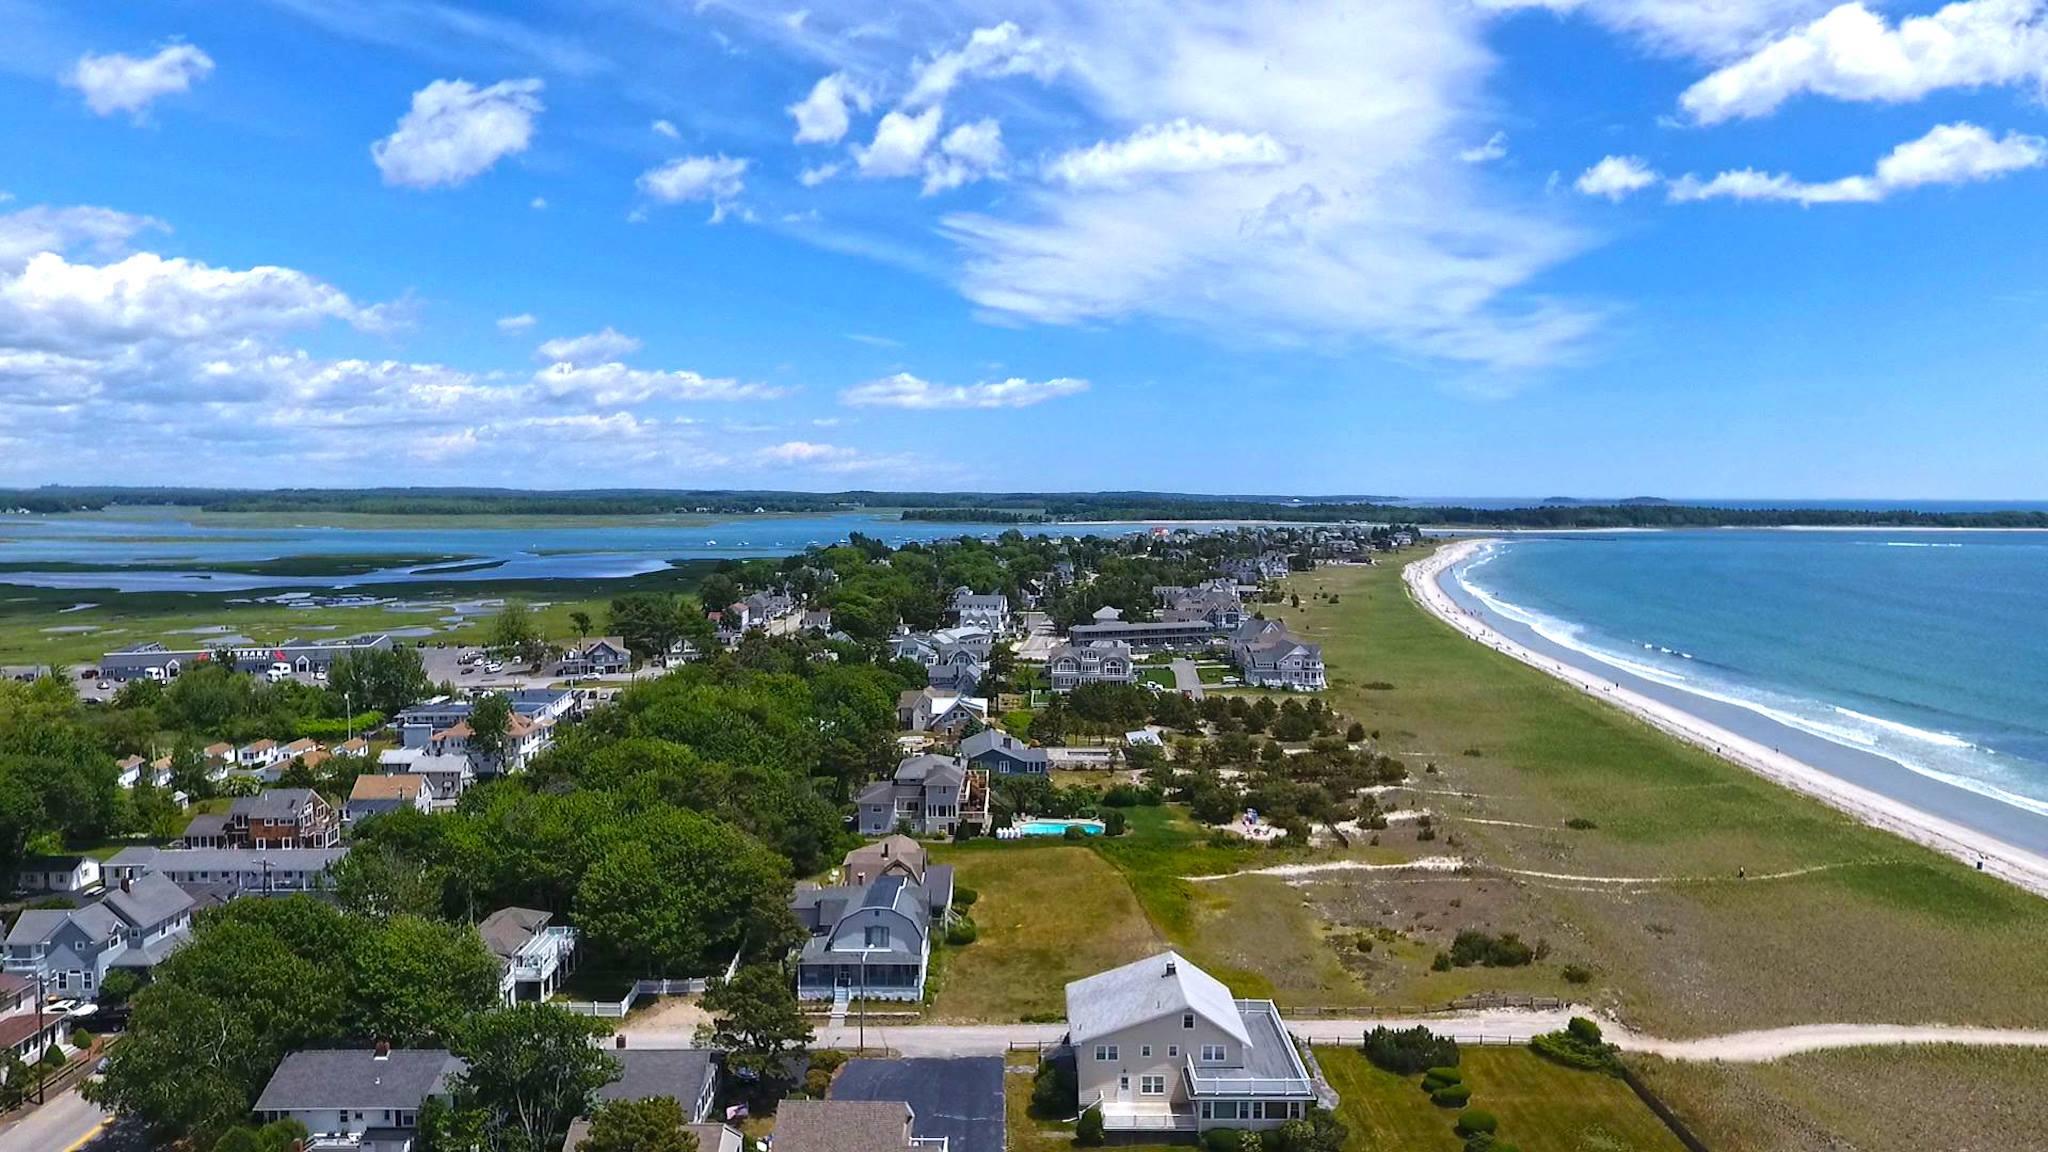 Bayley Vacation Rentals Beach Vacation Rental Management Company